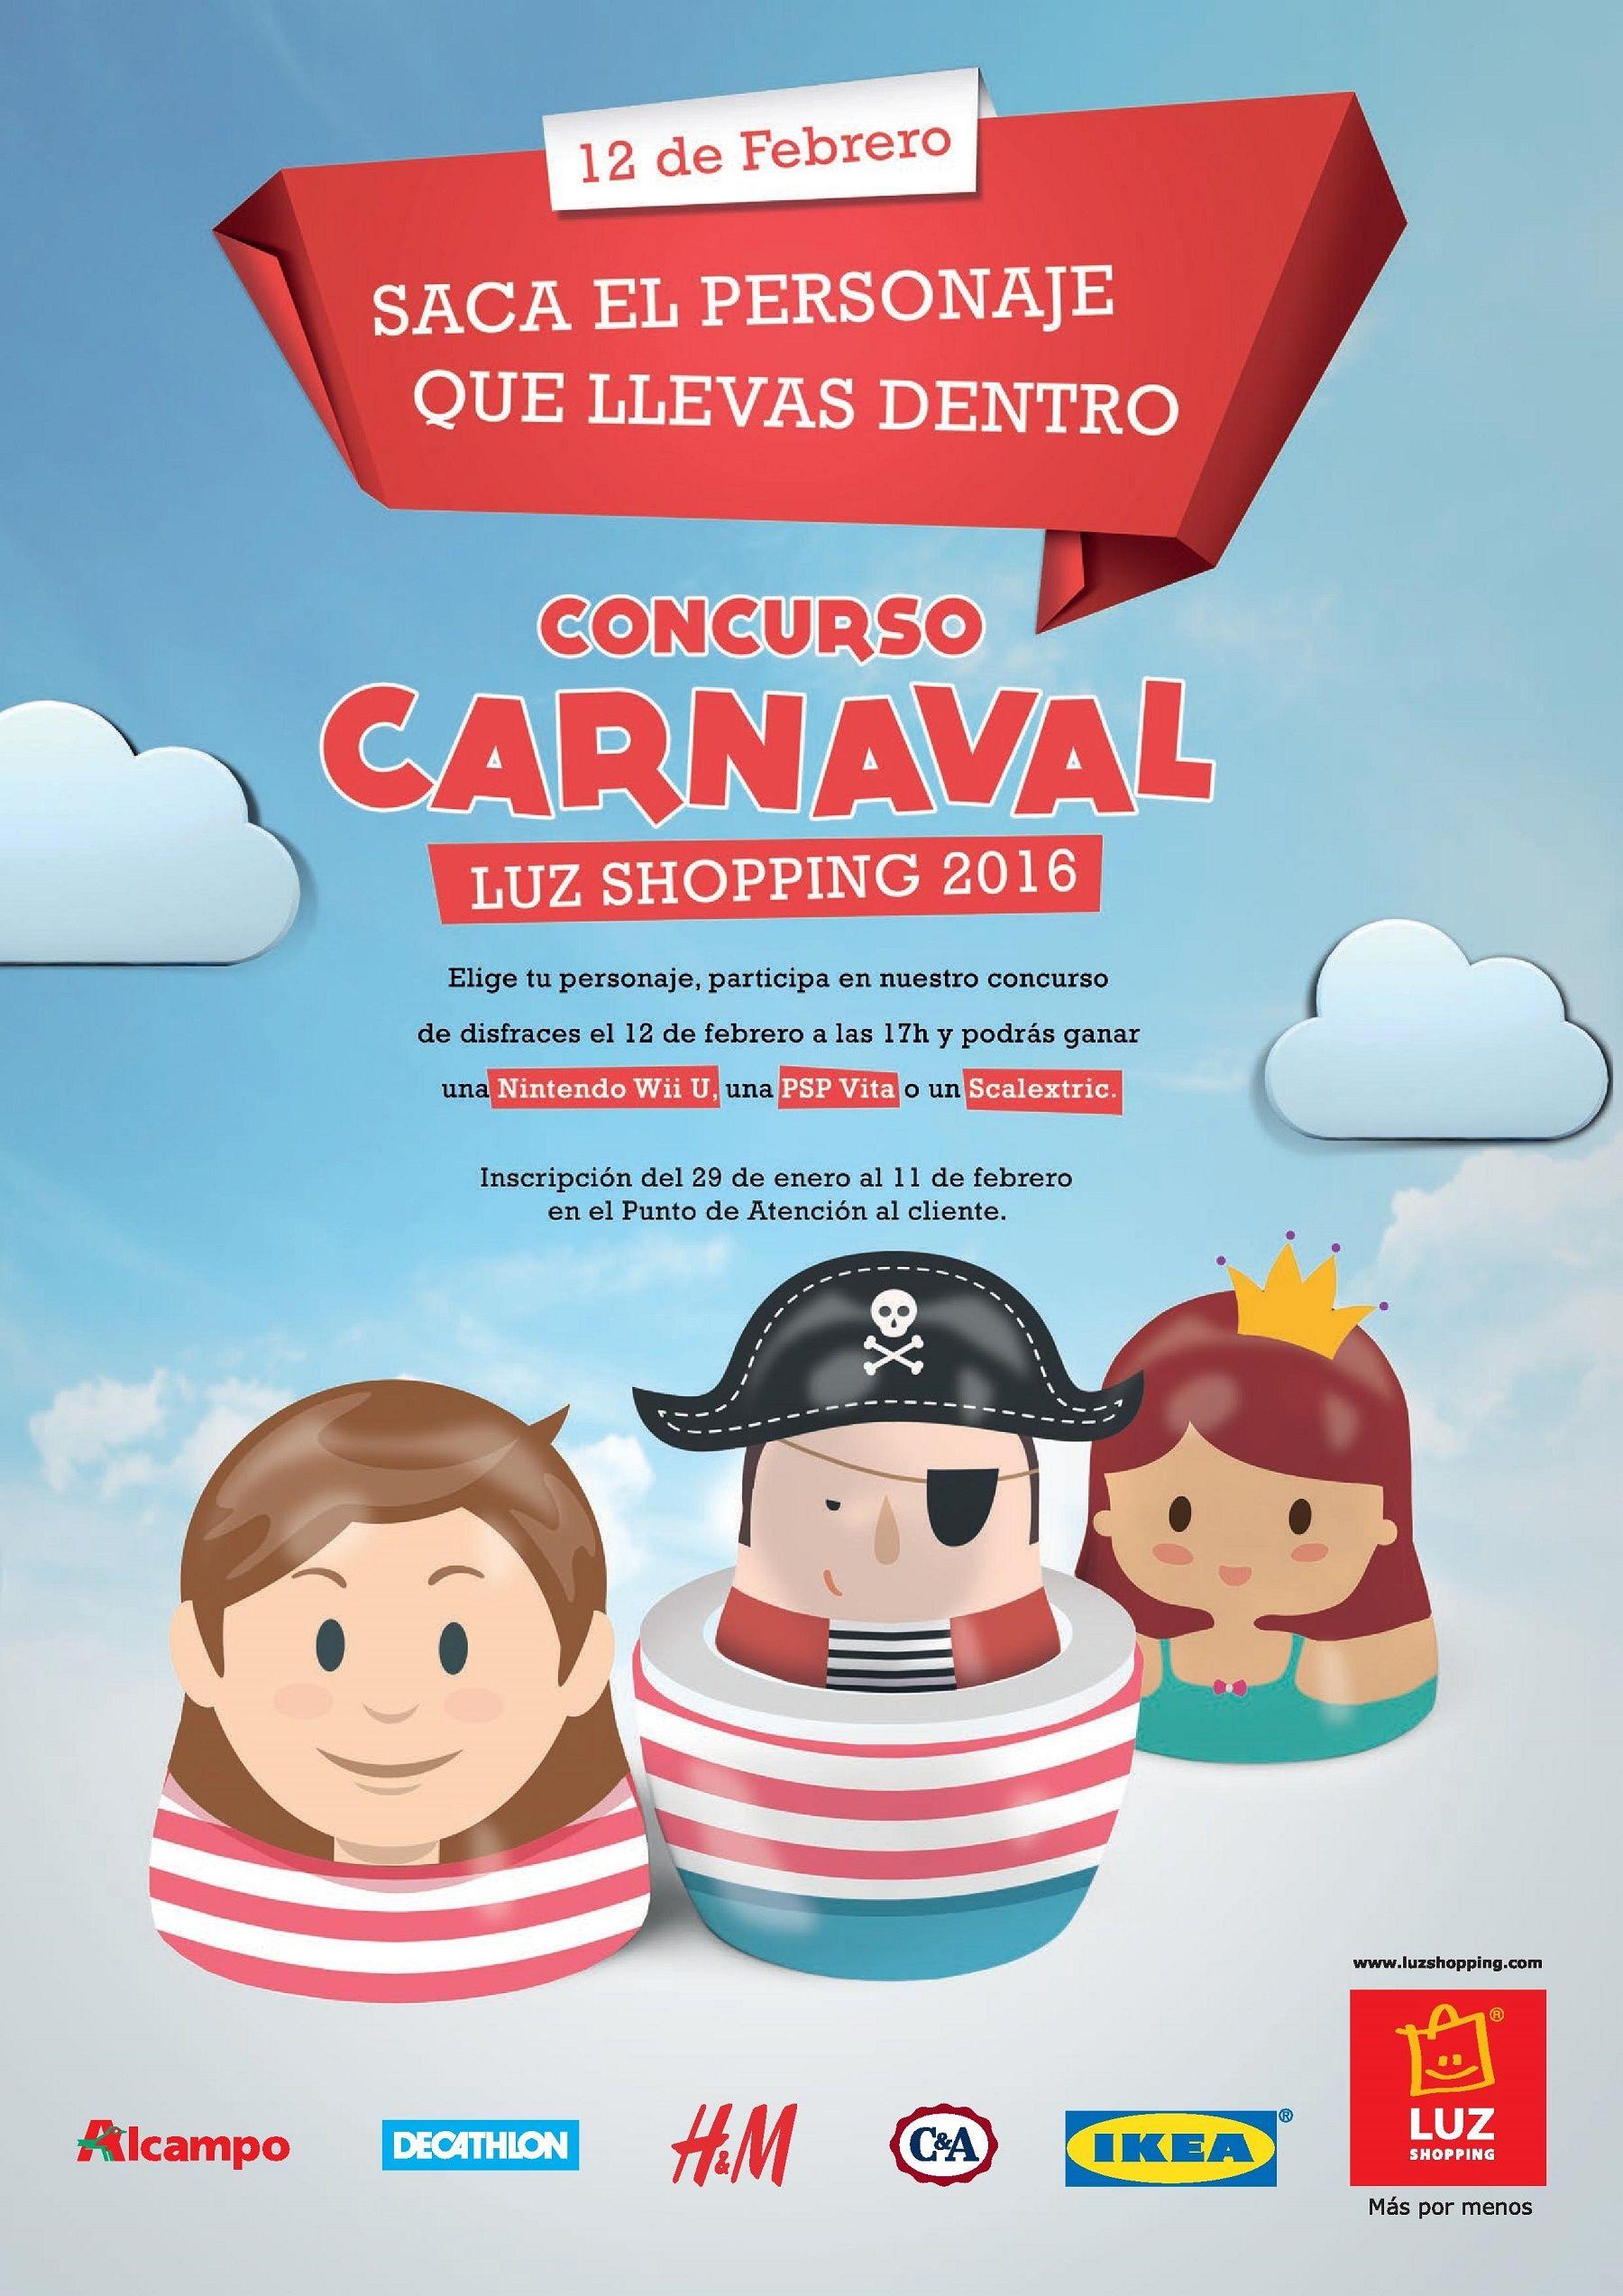 Carnaval LUZ Shopping